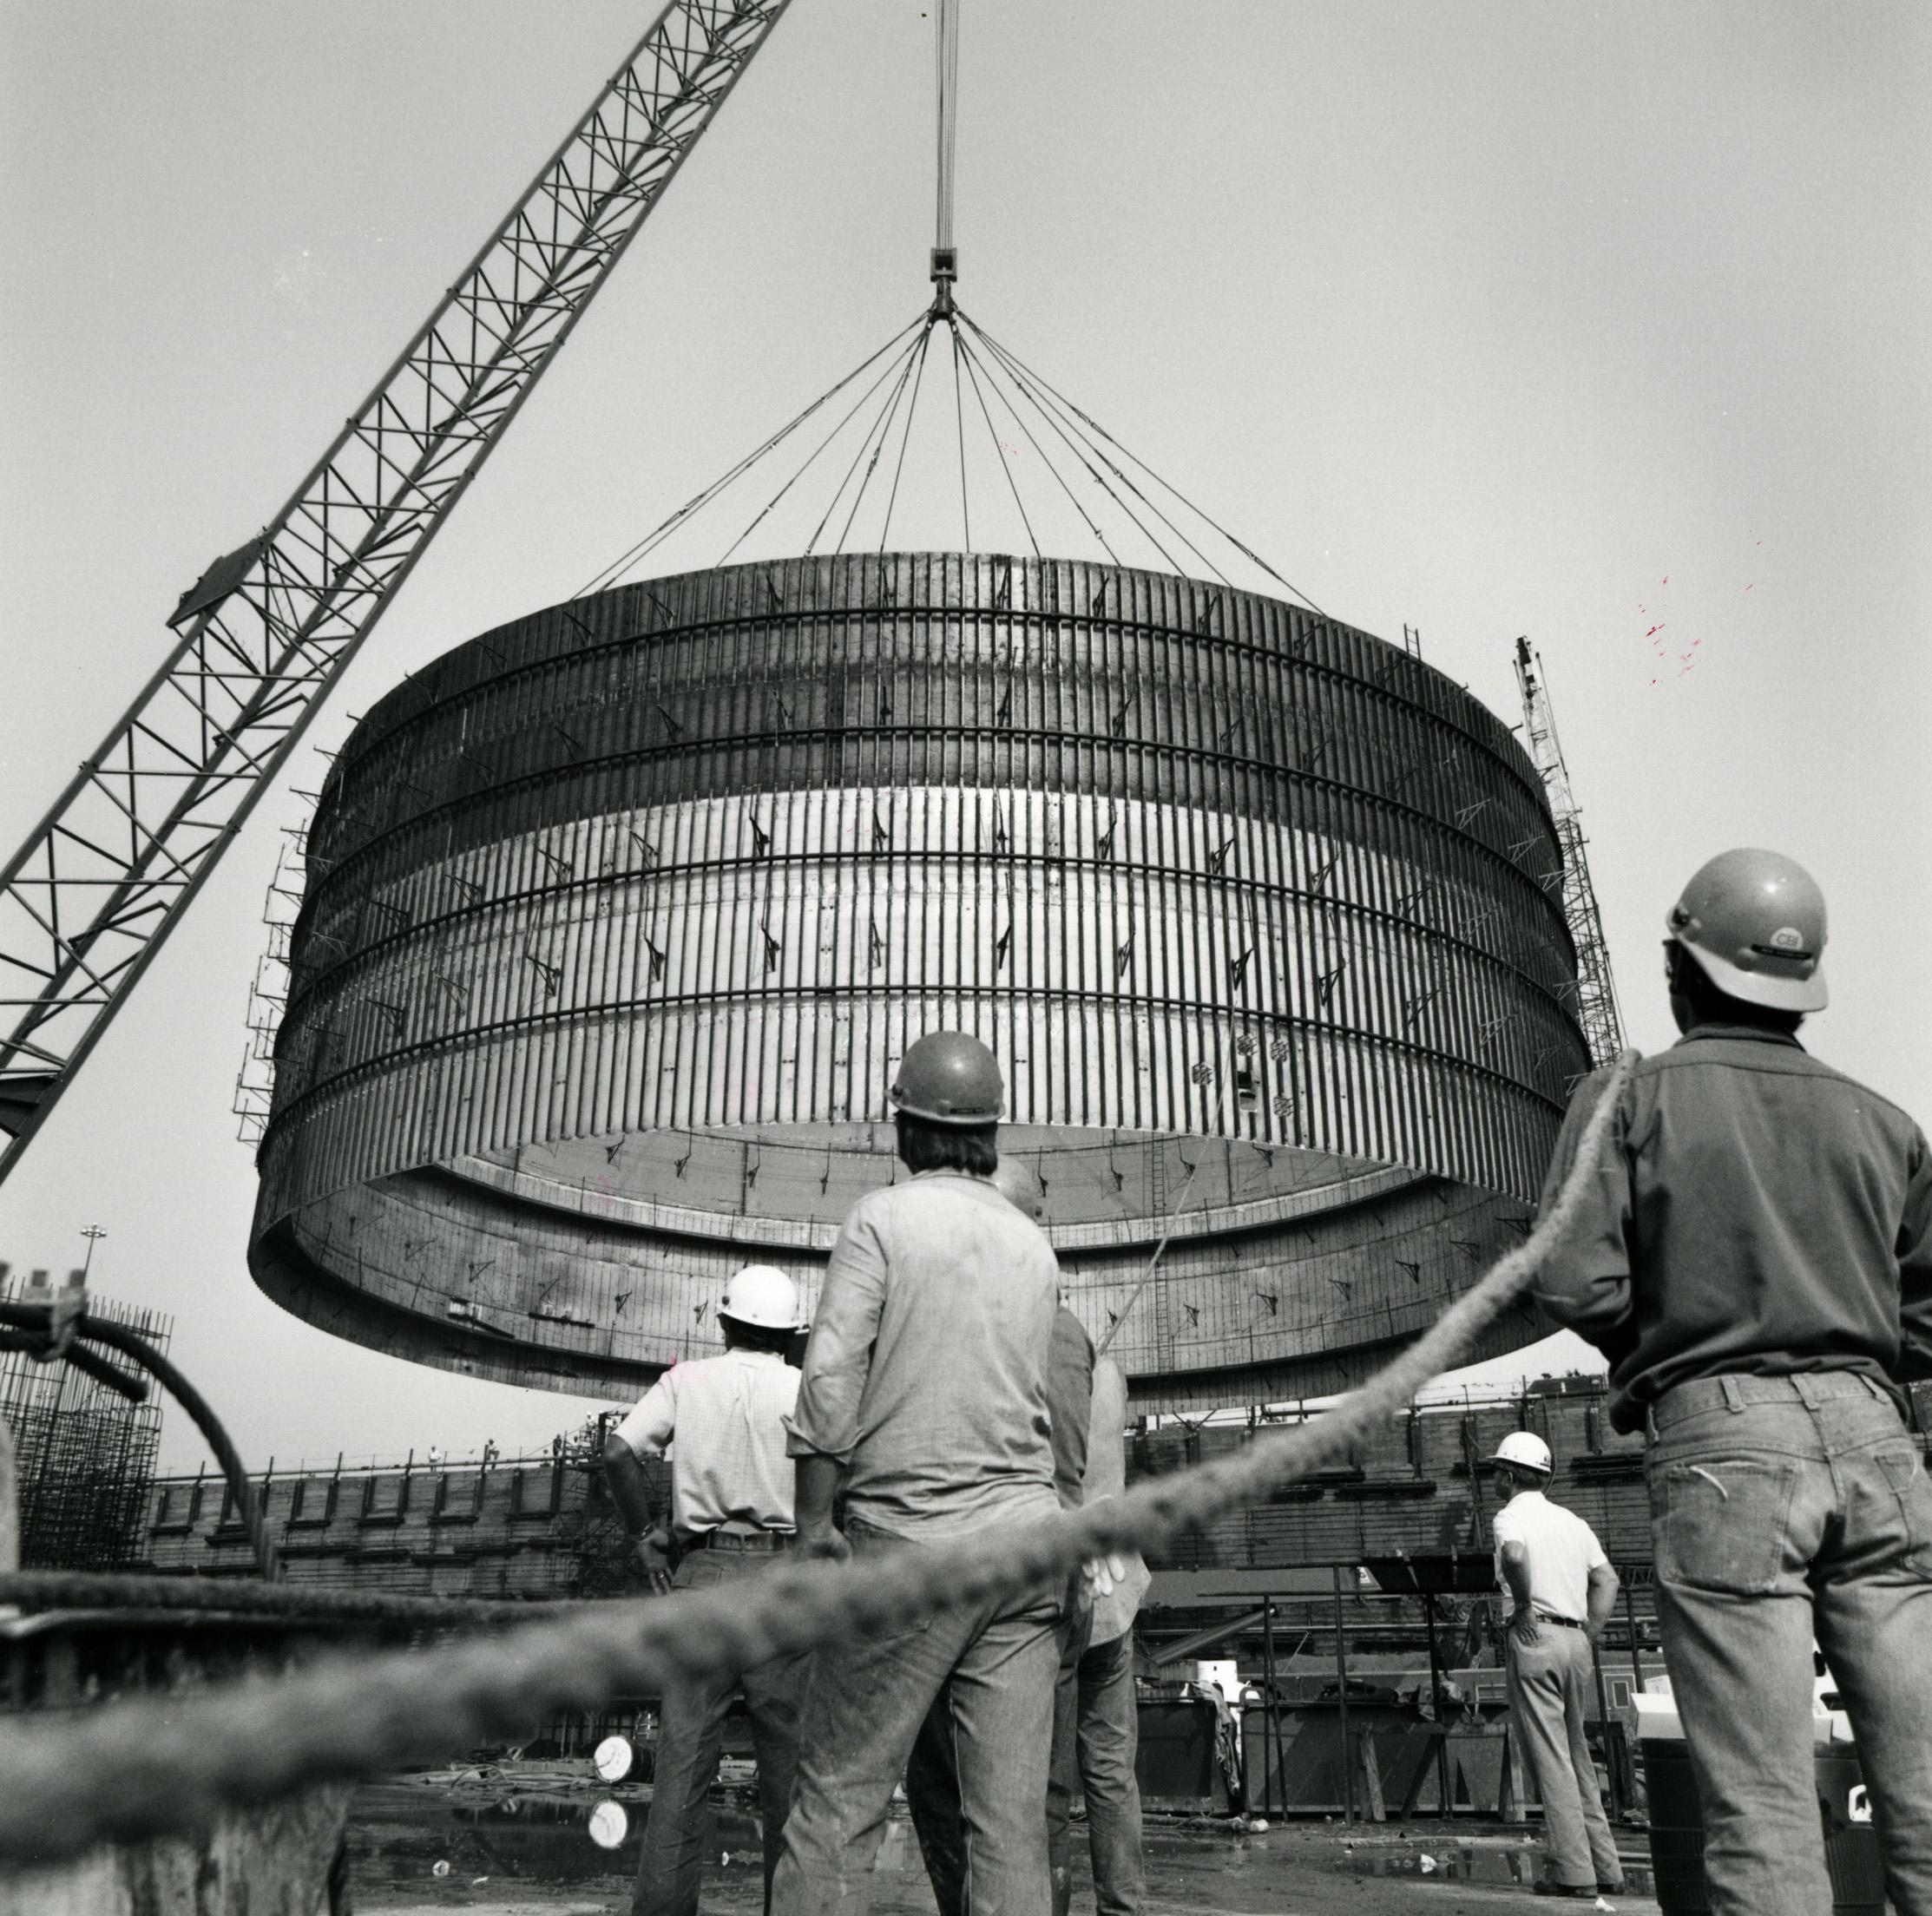 Boilermaker Heavy Lift